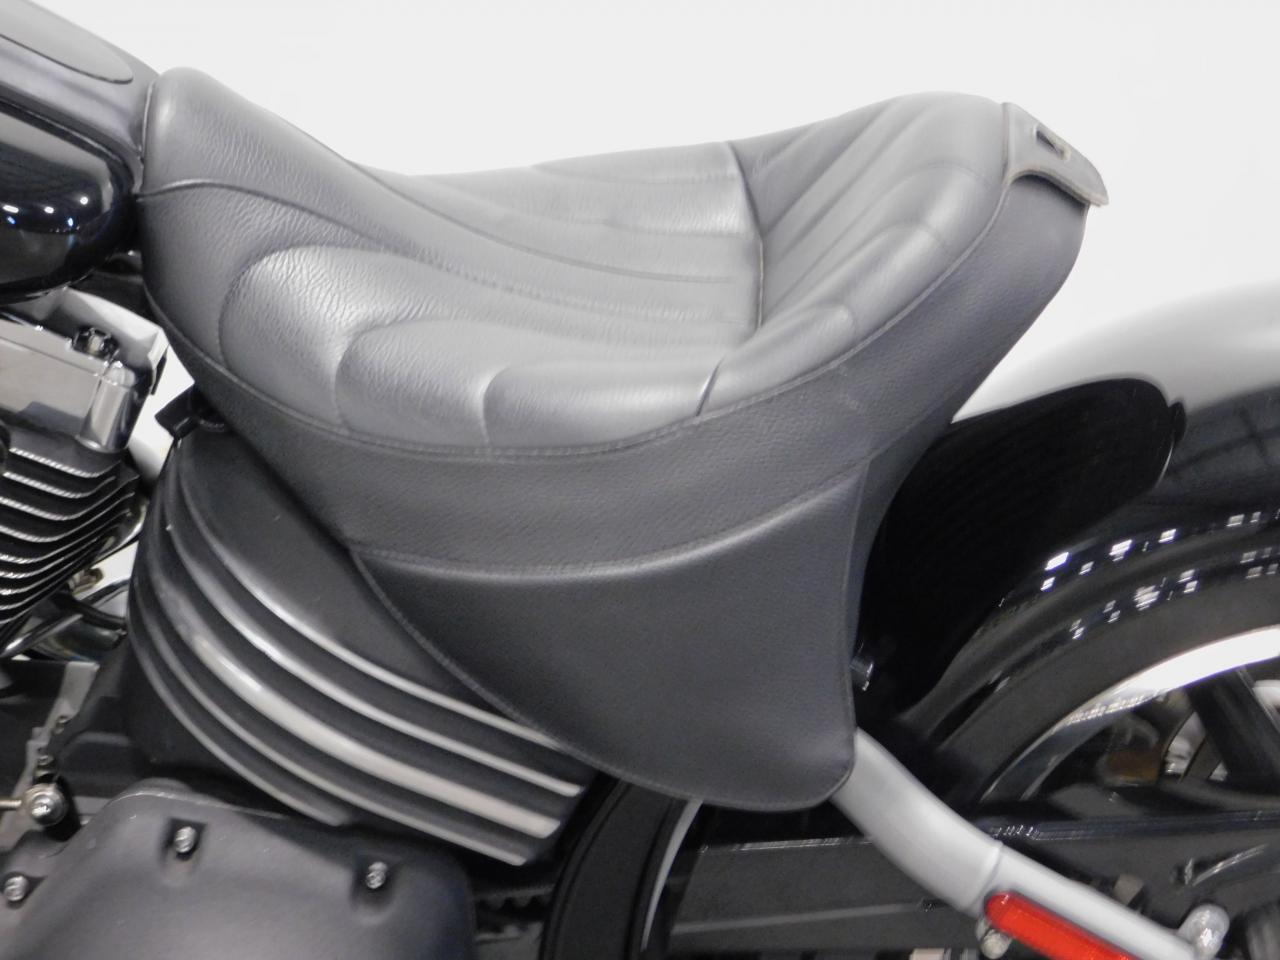 2008 Harley-Davidson FXCW (CC-1340556) for sale in O'Fallon, Illinois